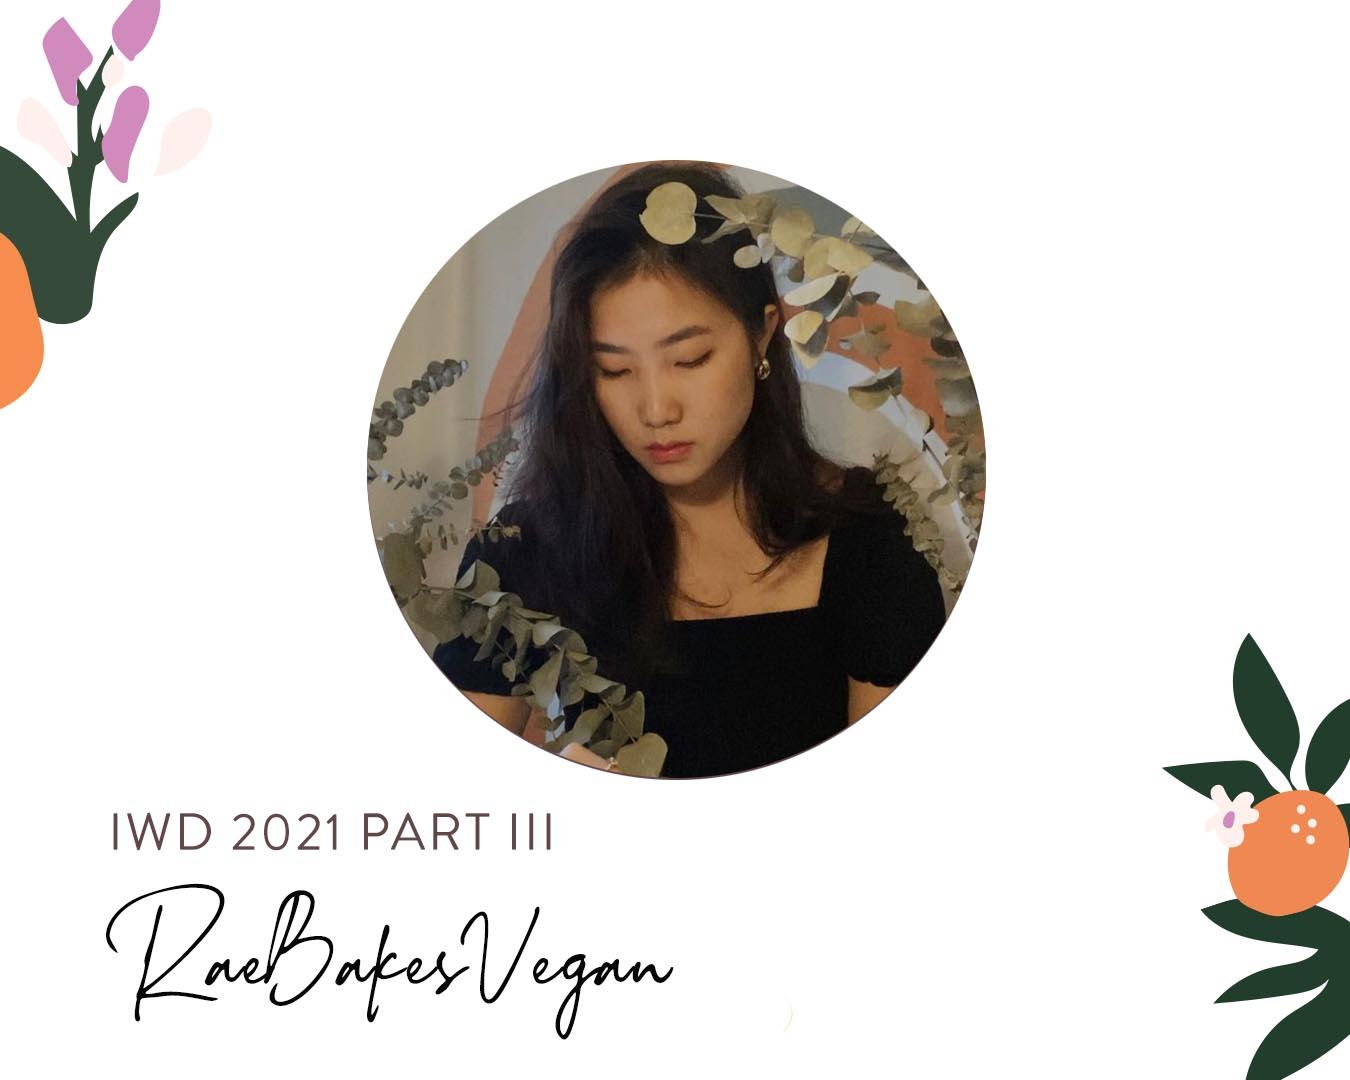 IWD 2021 Part III: RaeBakesVegan